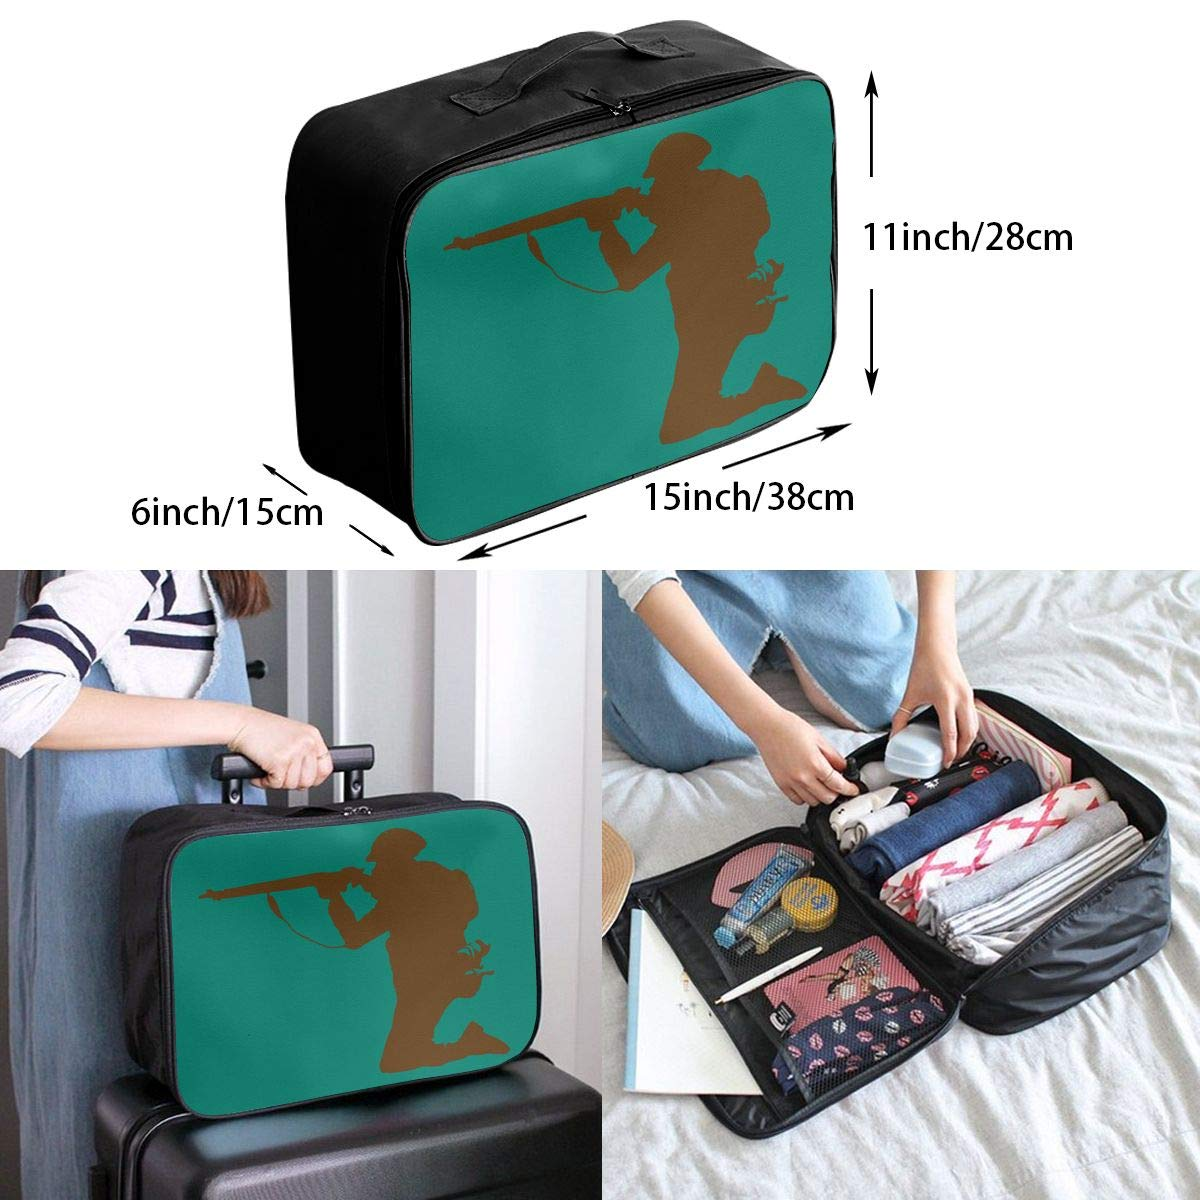 Travel Luggage Duffle Bag Lightweight Portable Handbag Soldier Large Capacity Waterproof Foldable Storage Tote